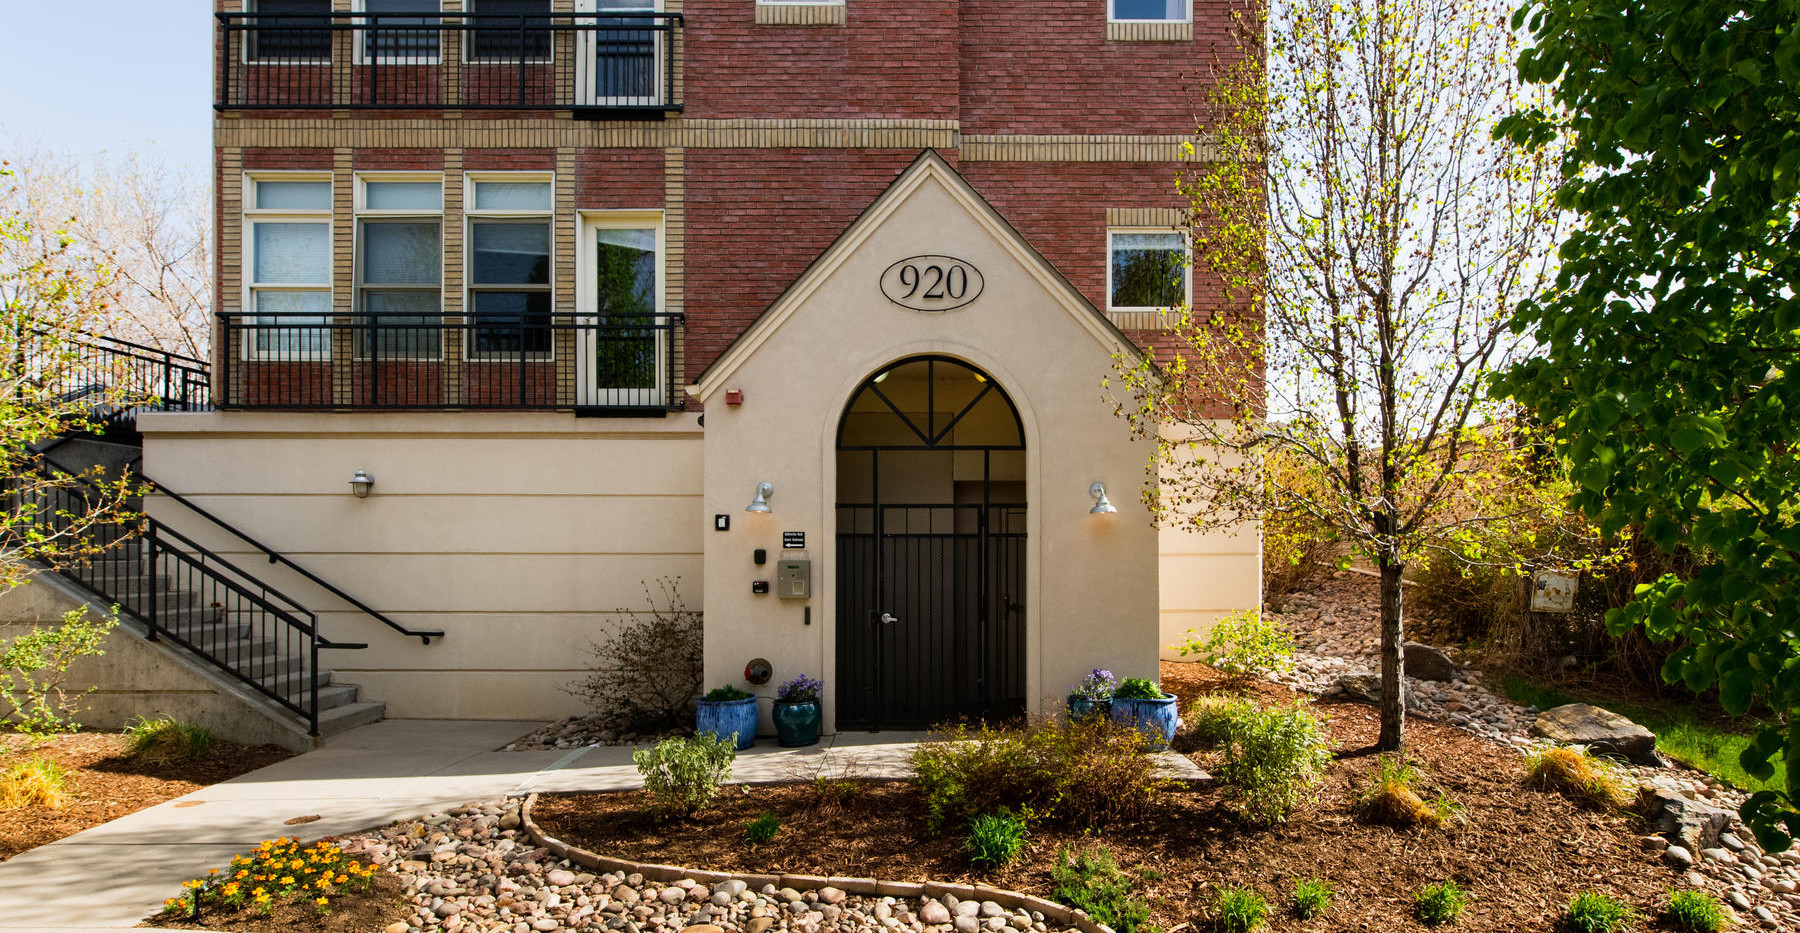 920 E 17th Avenue-014-032-Exterior-MLS_S